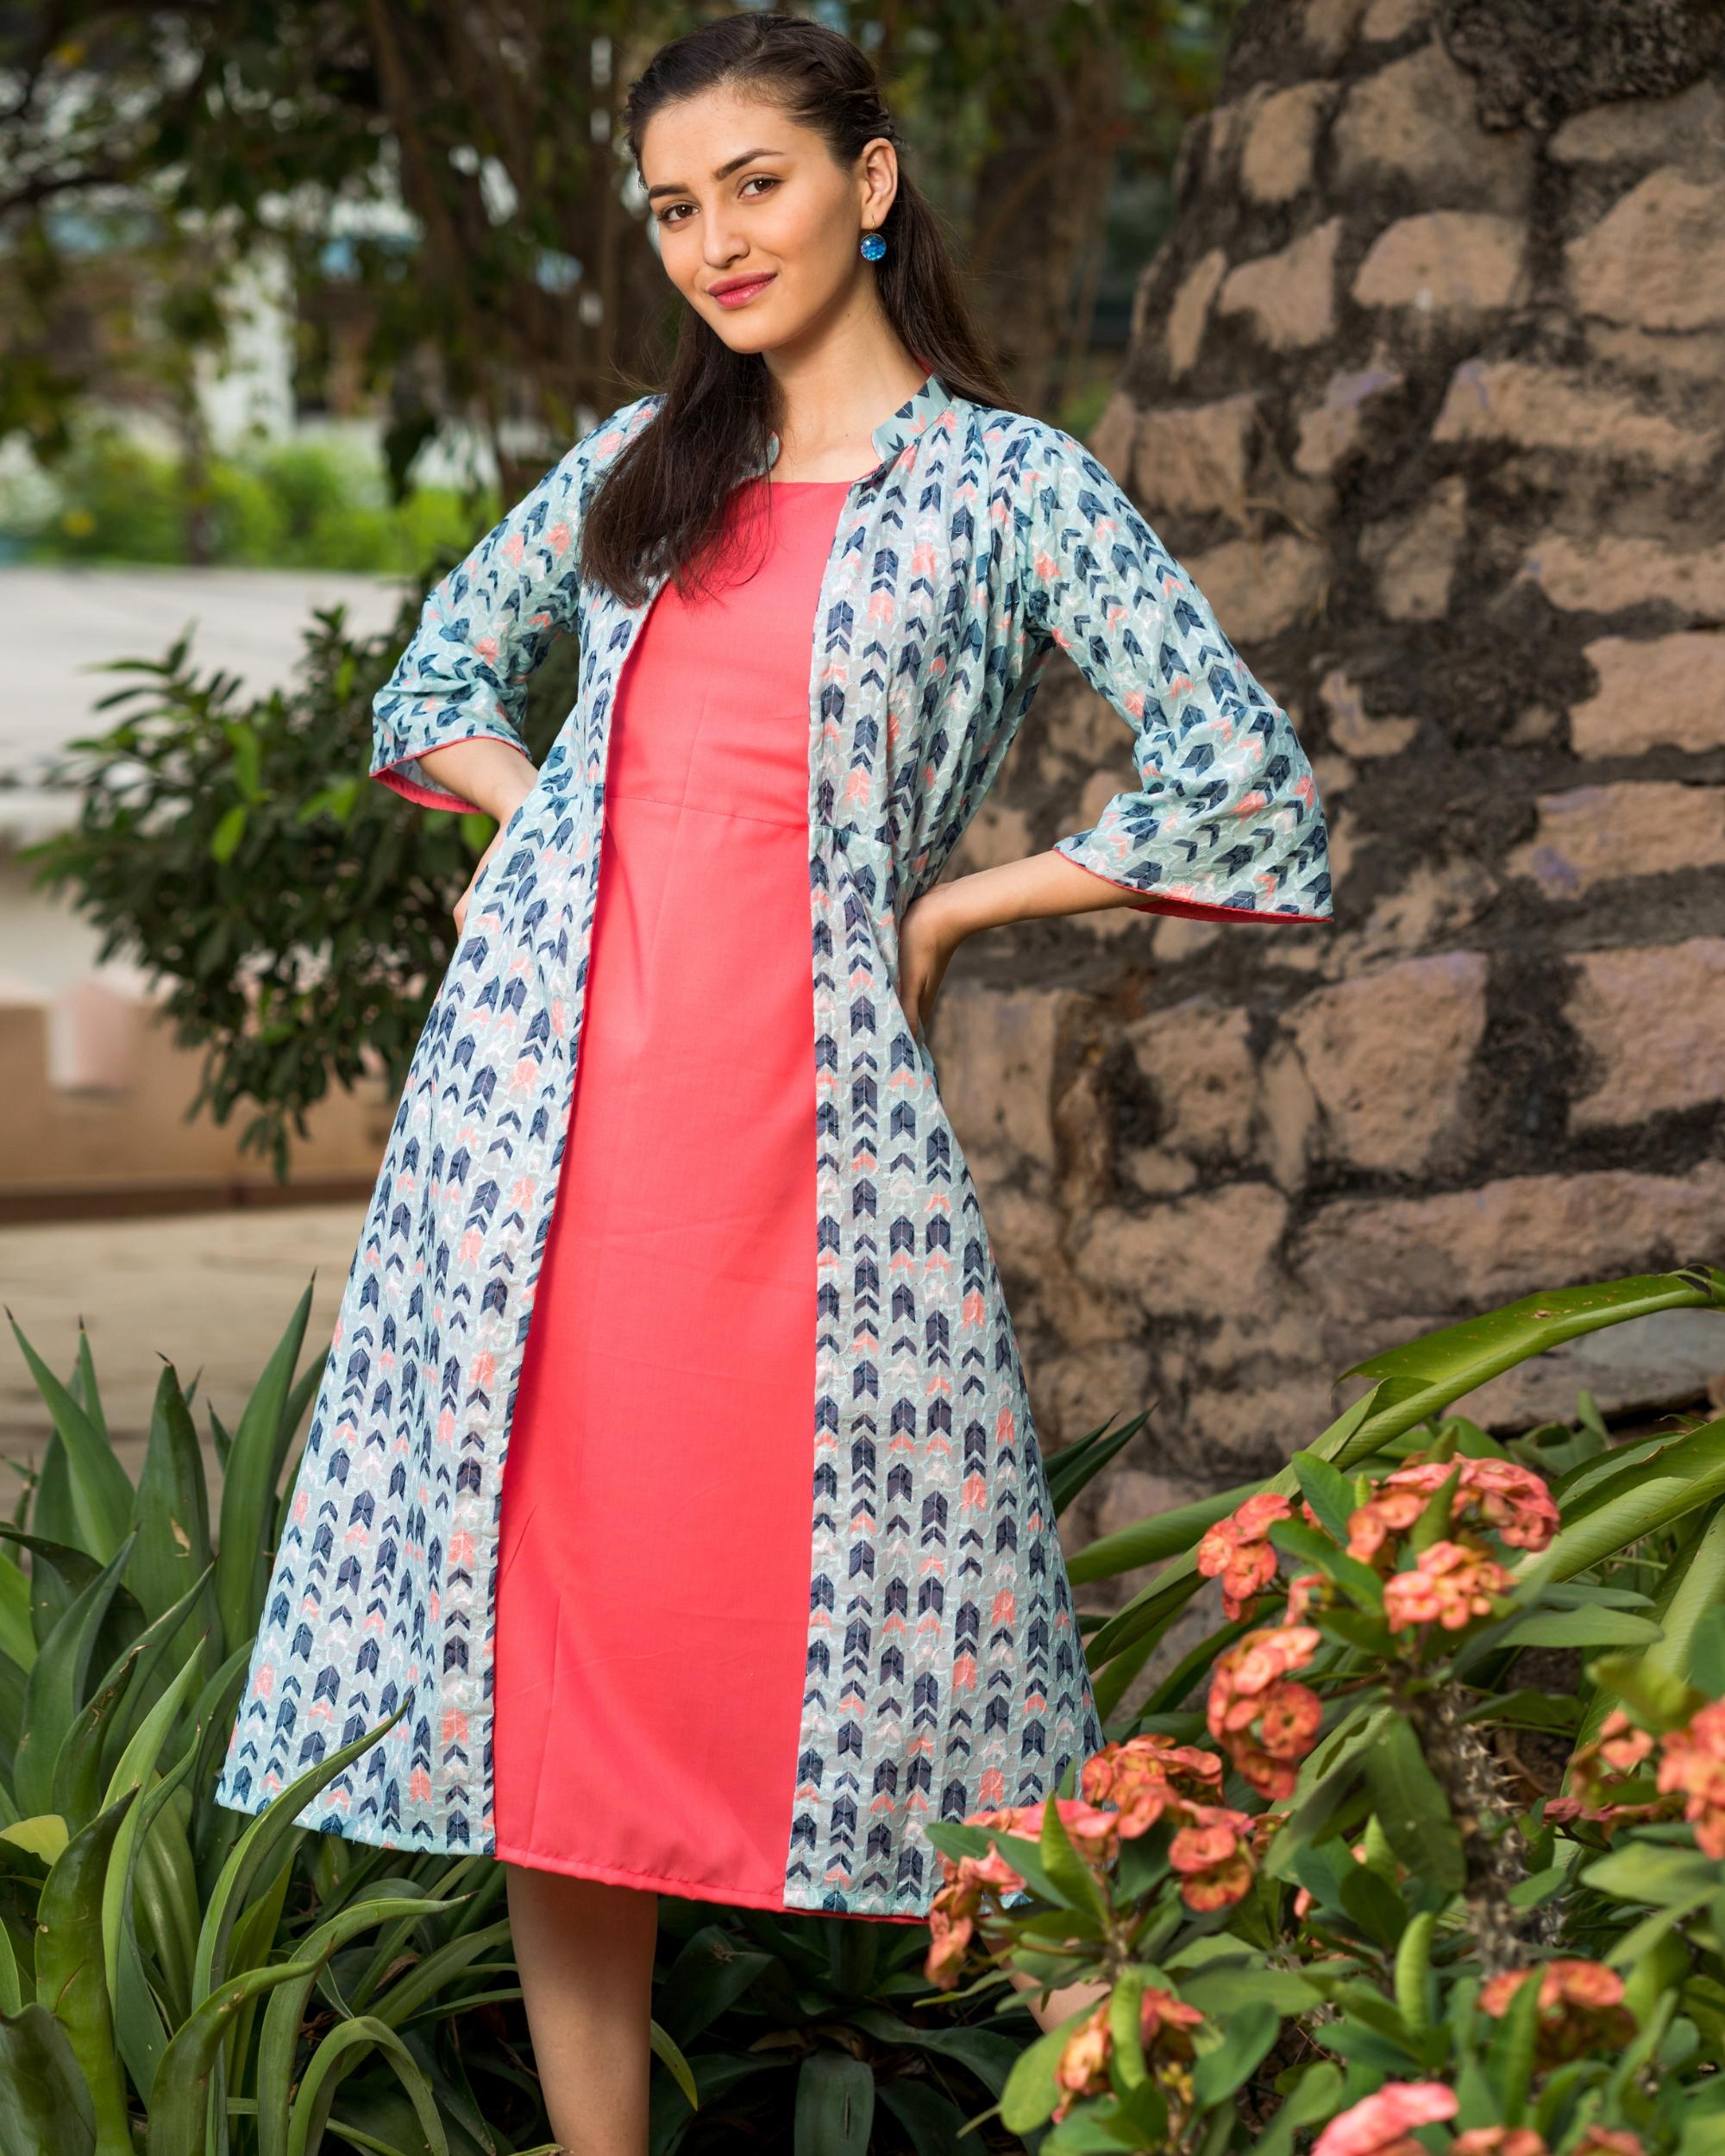 Pink inner dress with schifi work jacket